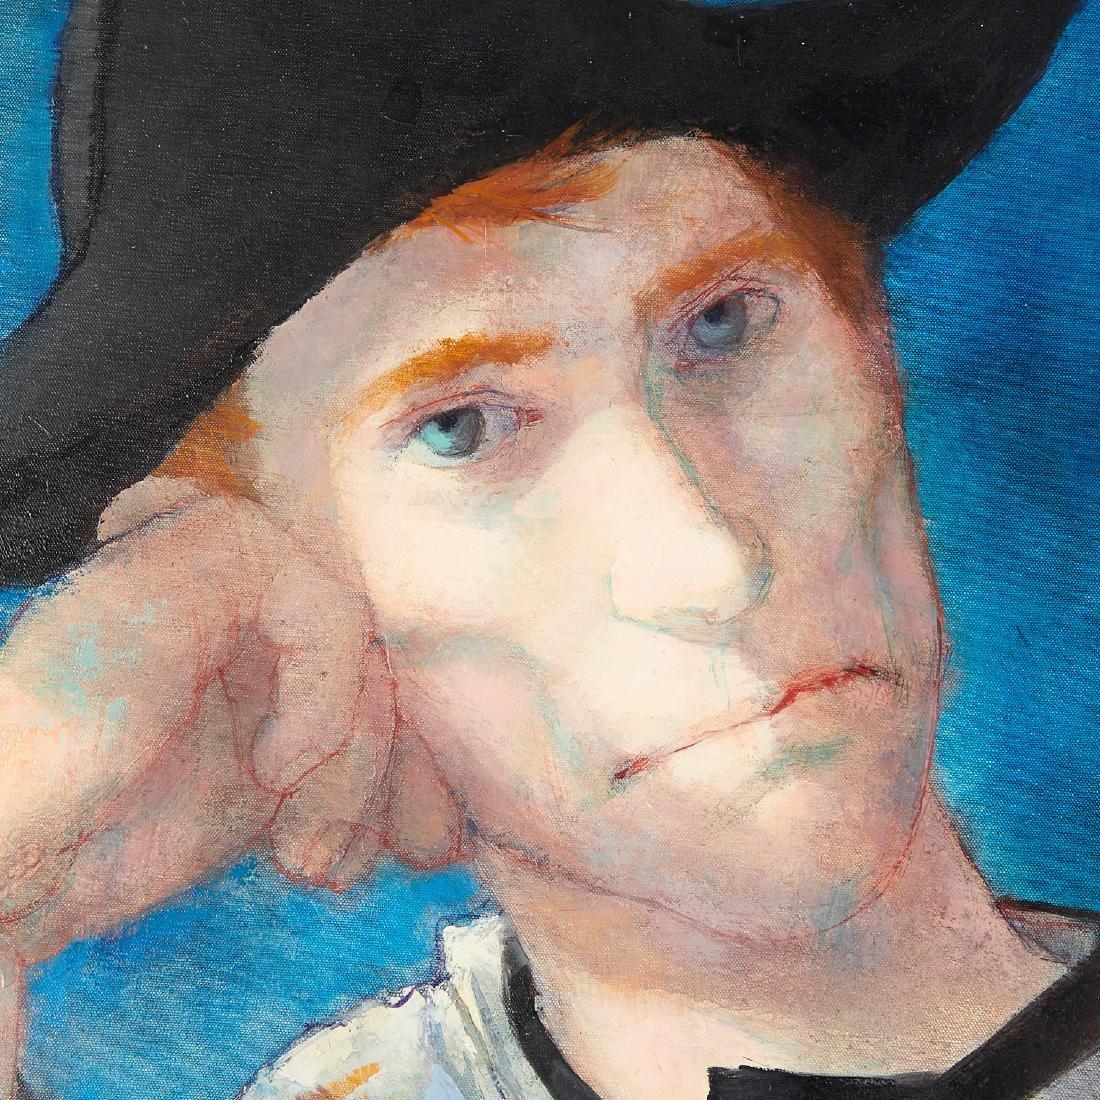 Michel Ciry, painting, 1964 - 4